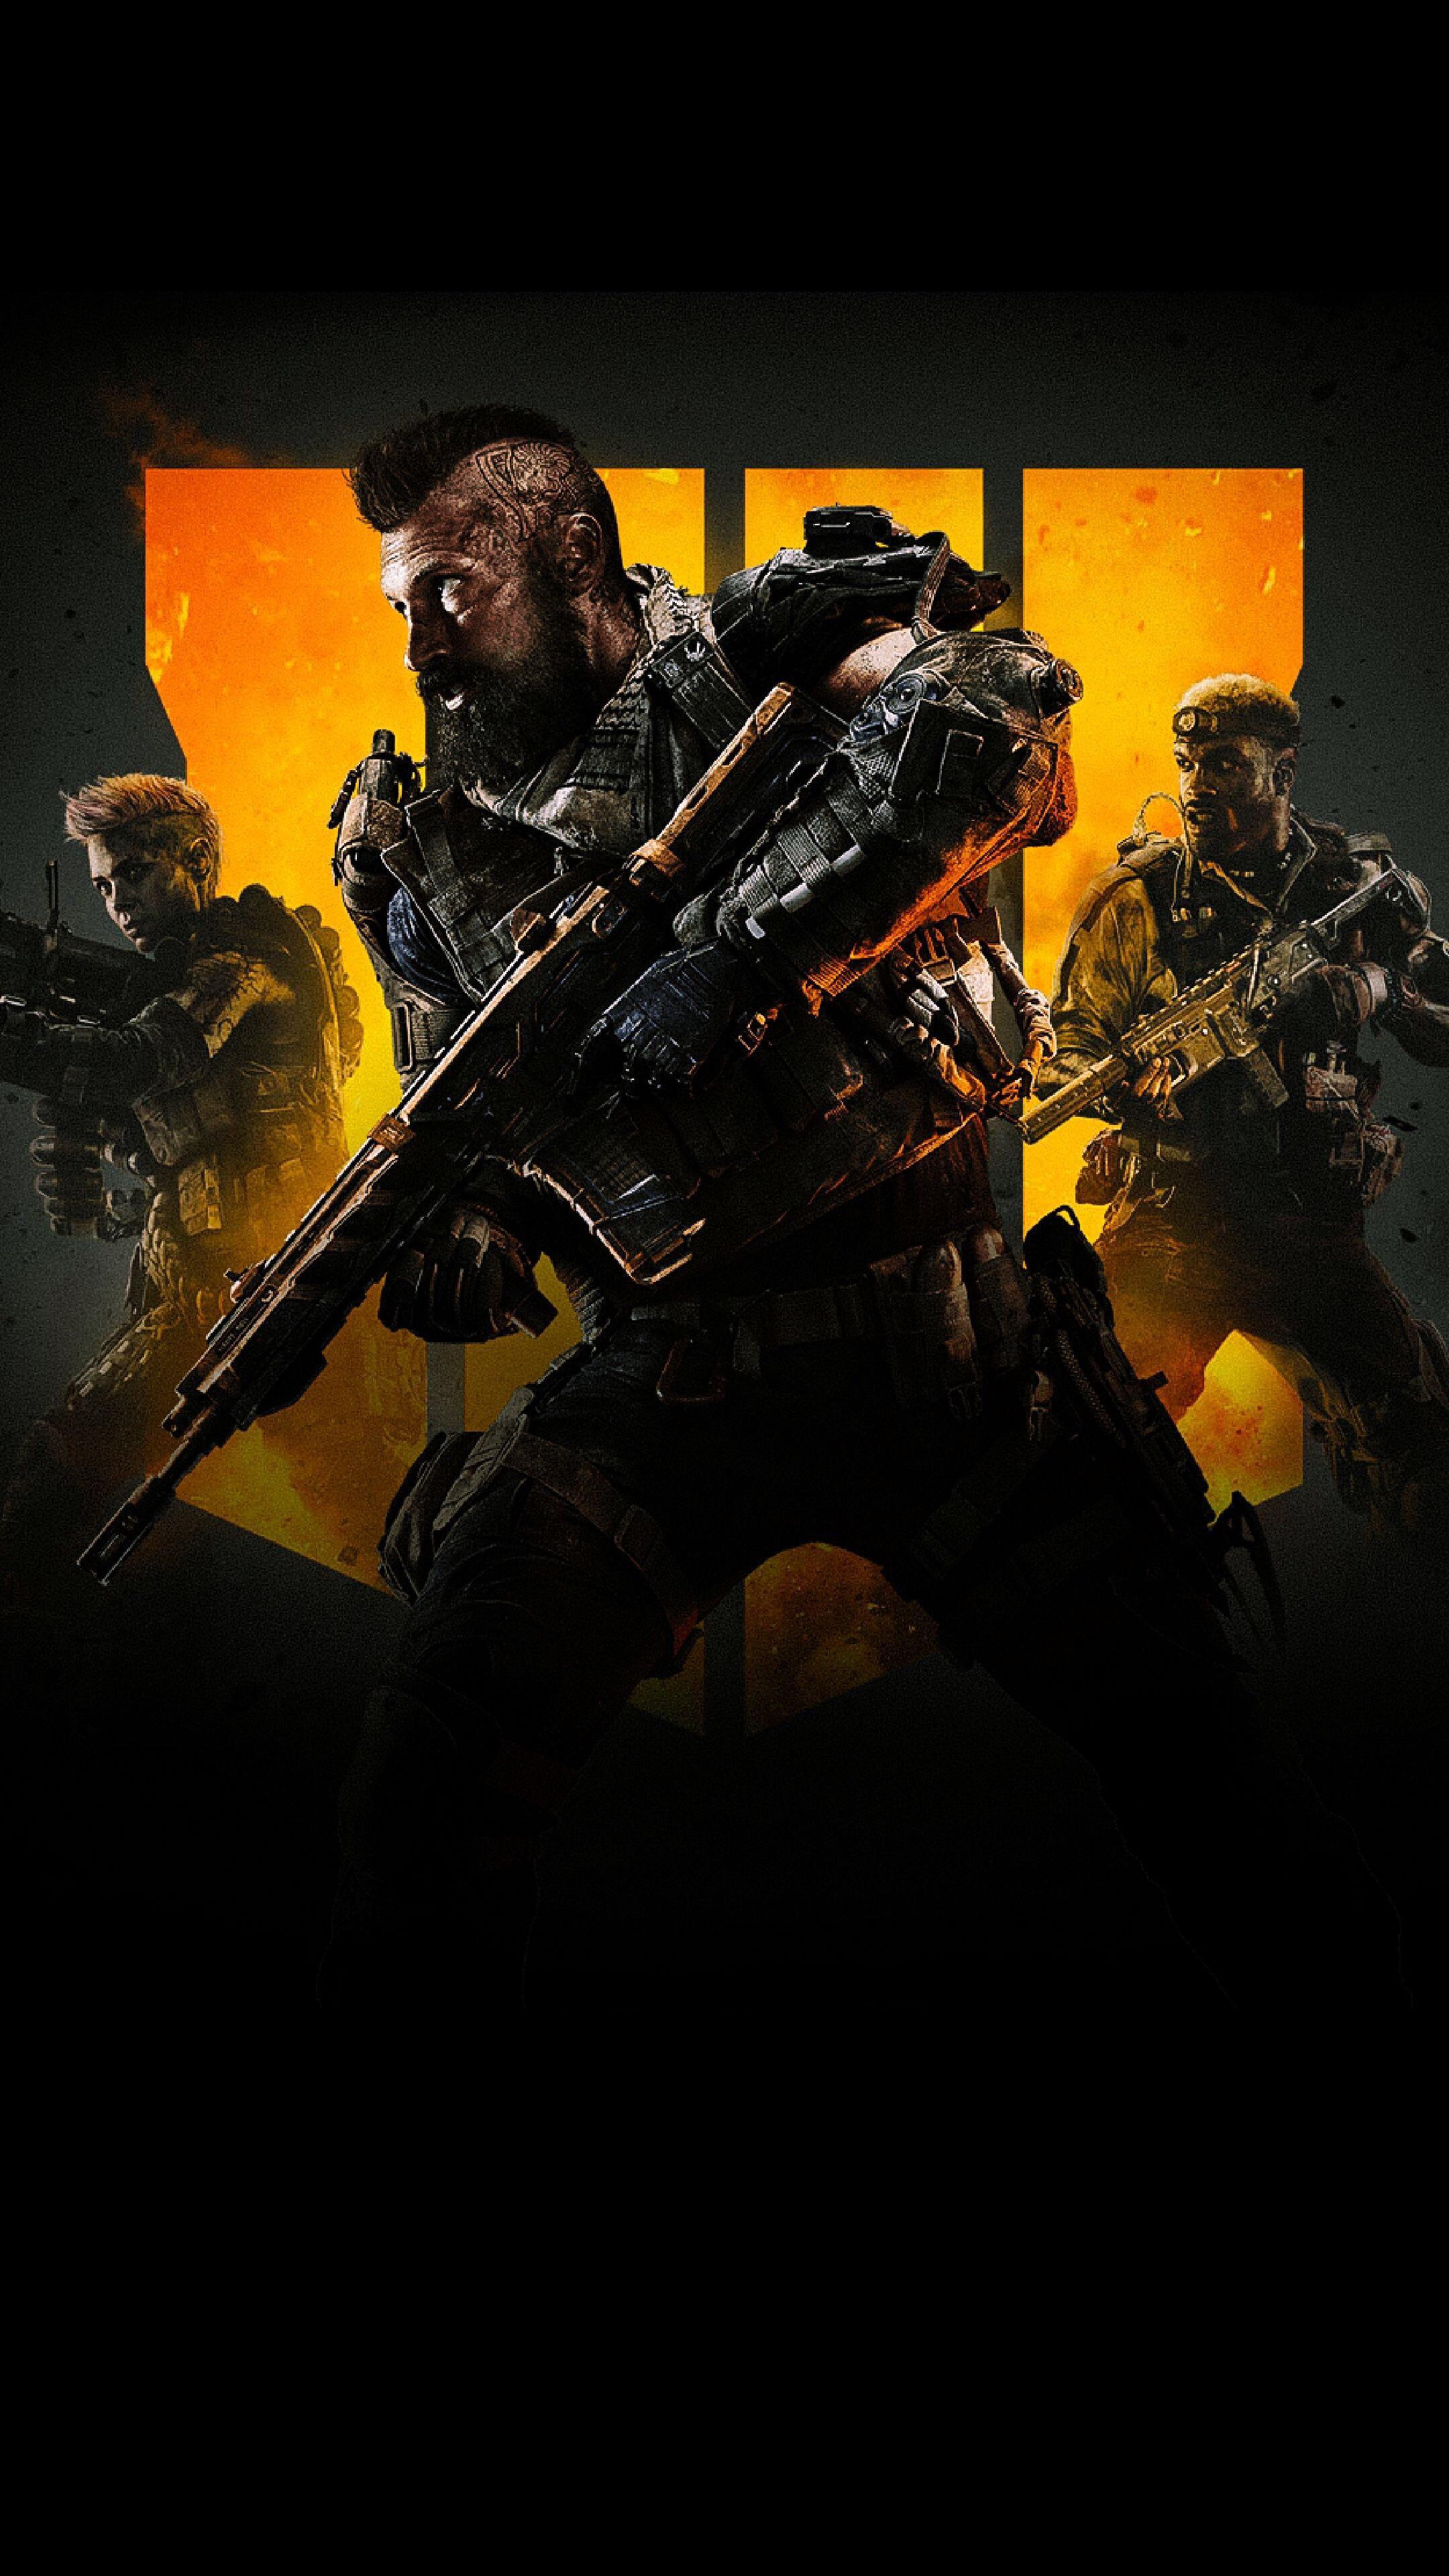 Call Of Duty: Black Ops 4 - HD Wallpaper